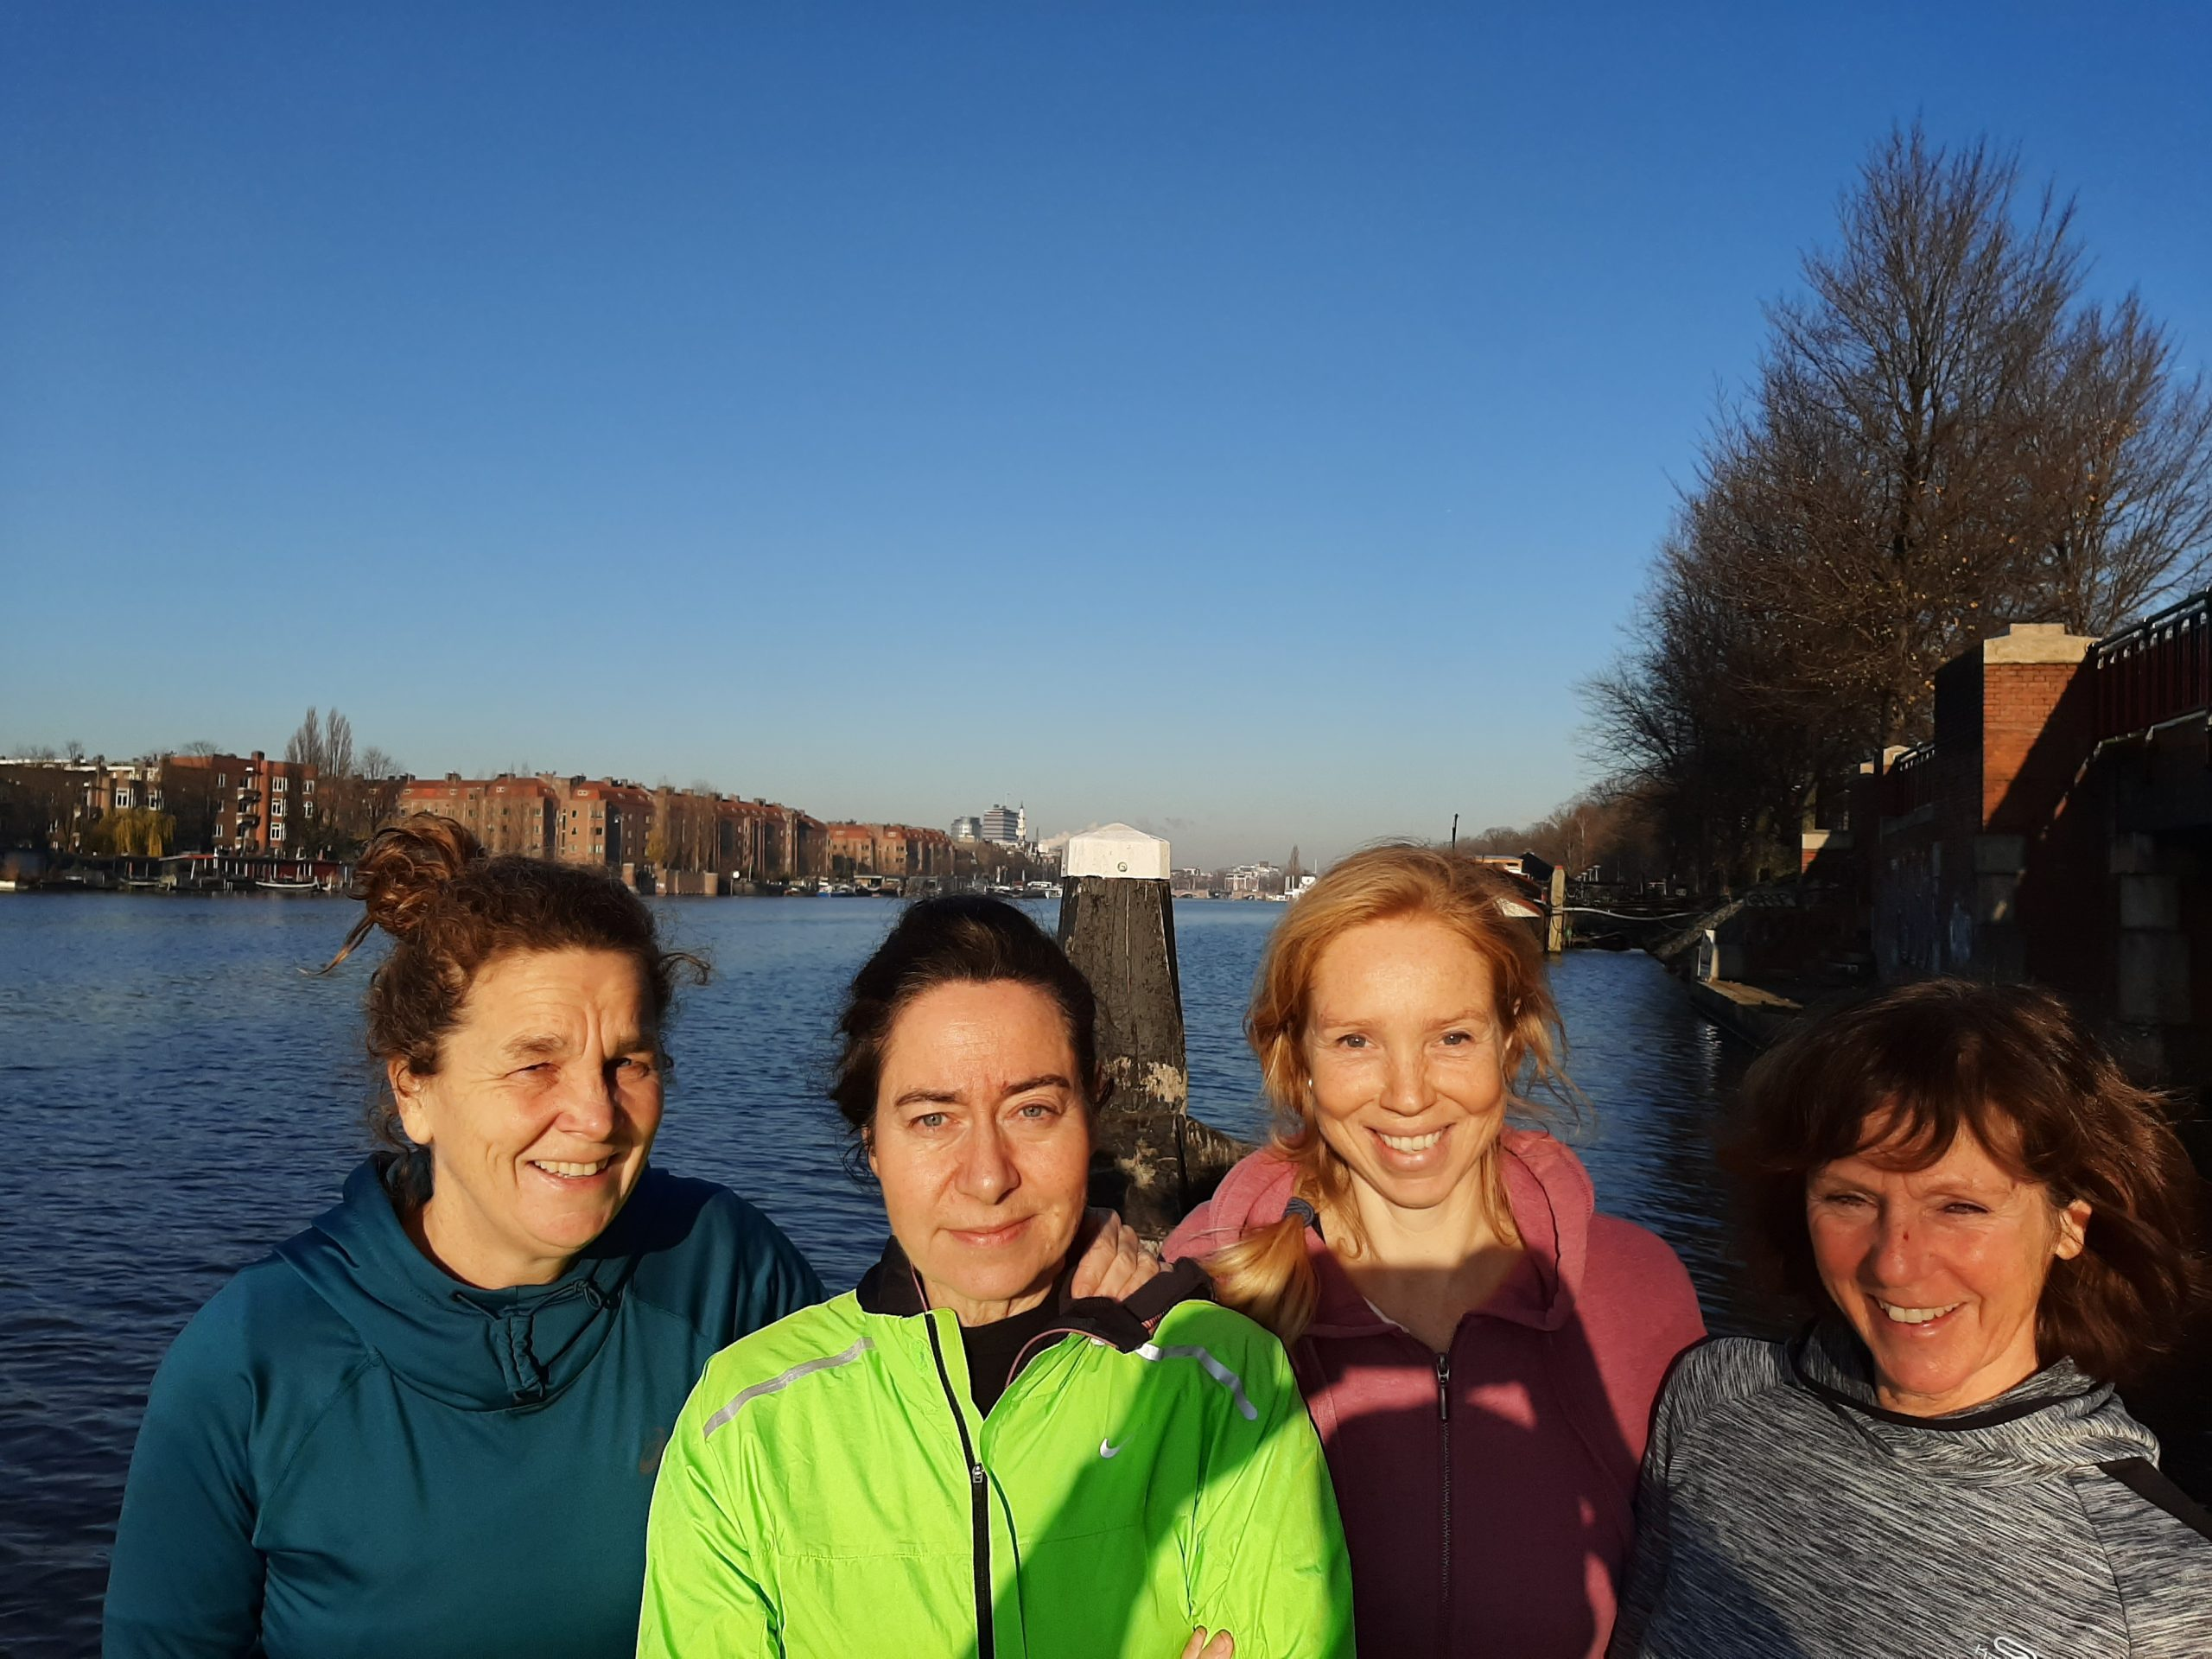 Vlotverhalen: Tessa, Annemiek, Mathilde en Eveline